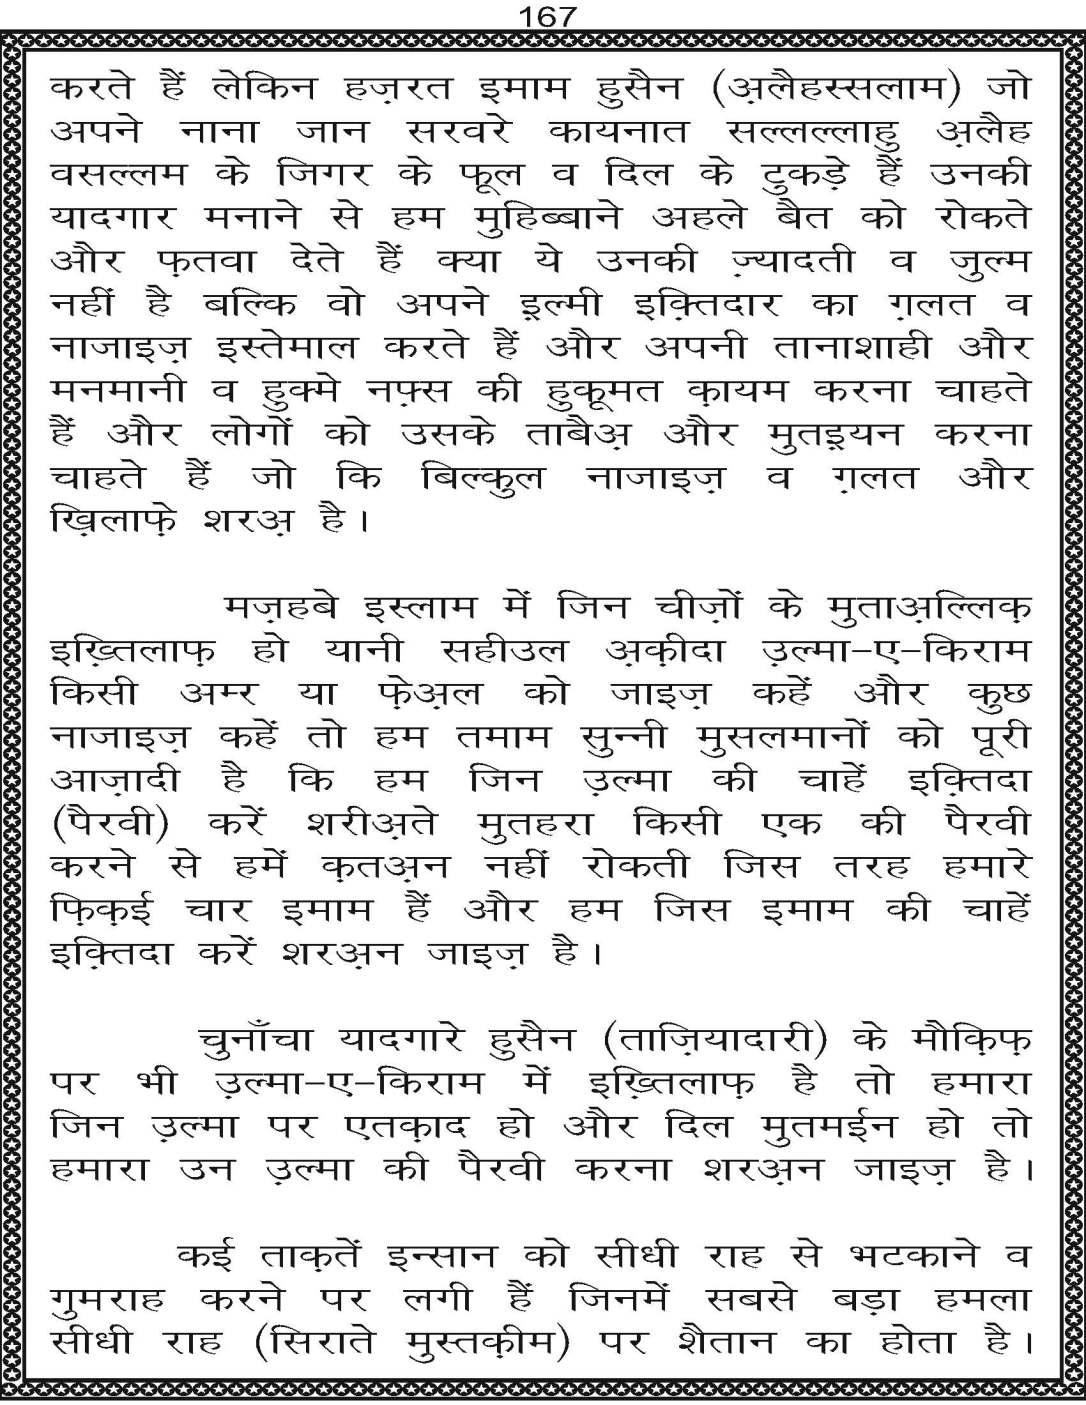 AzmateTaziyadari_Page_167